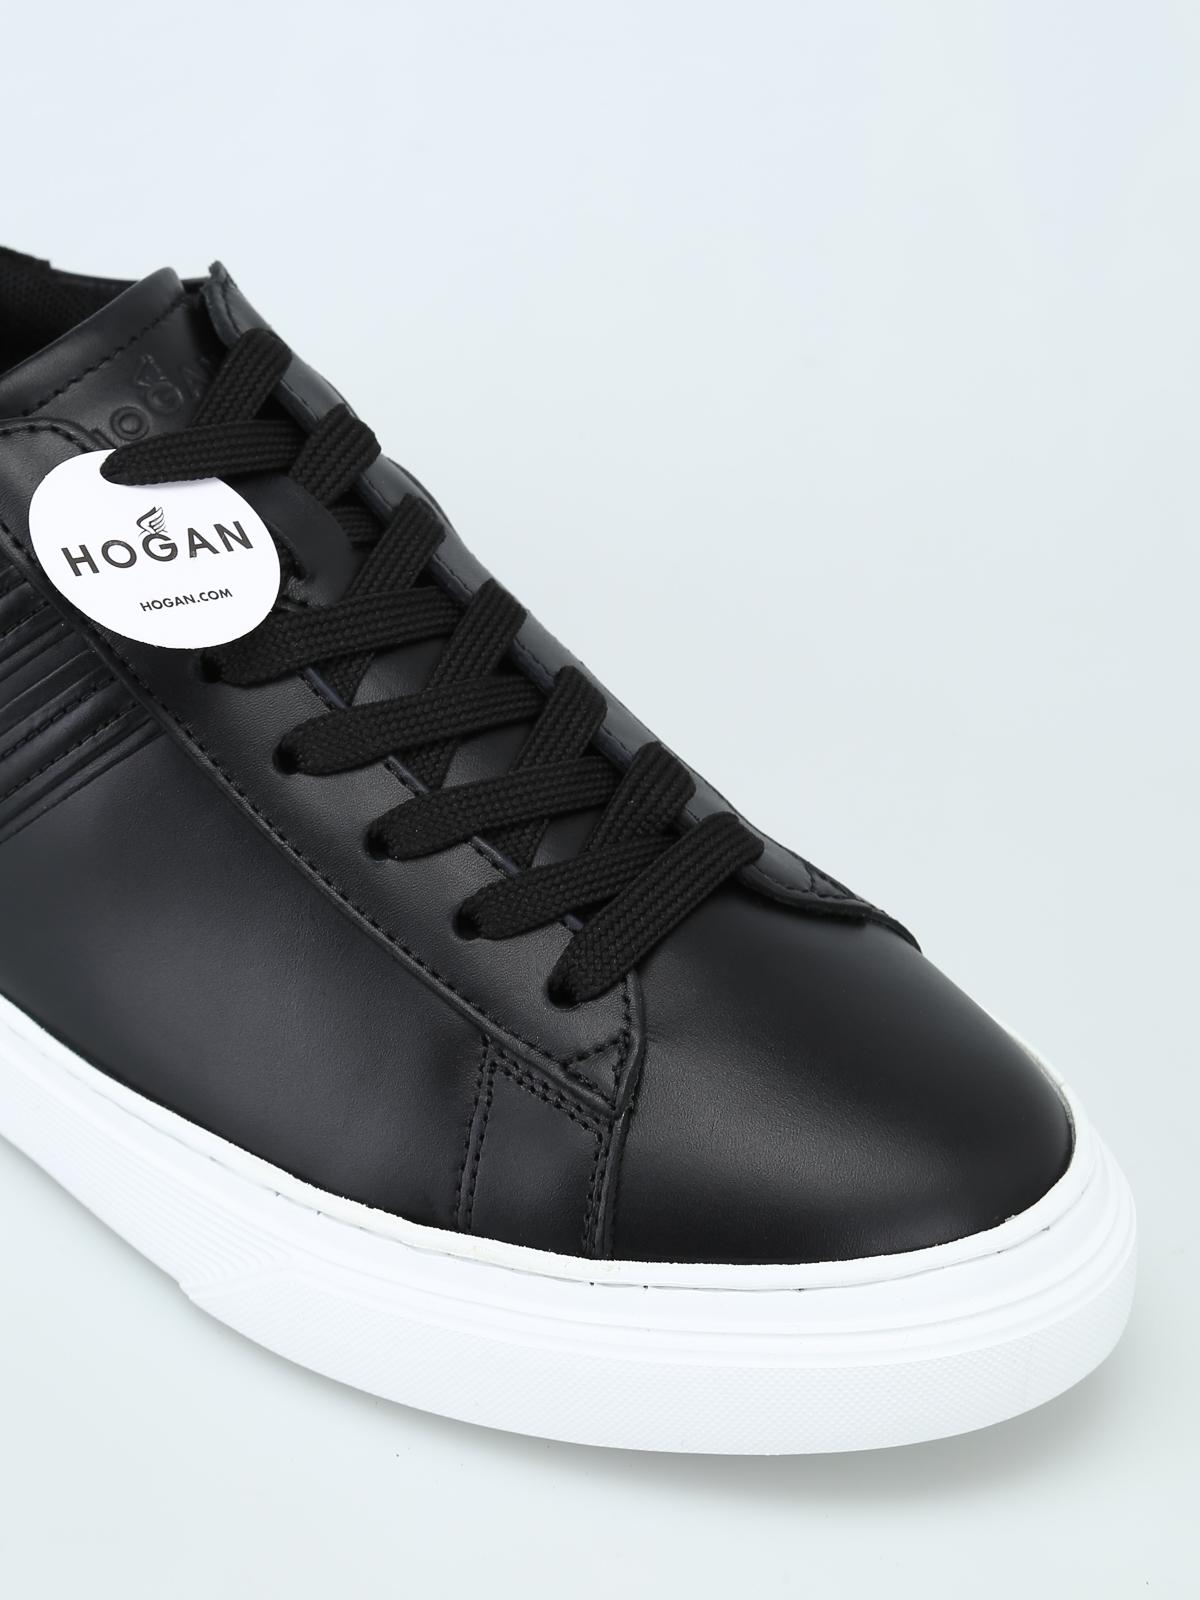 Trainers Hogan - Black H365 sneaker - HXM3650J310IHVB999 | iKRIX.com